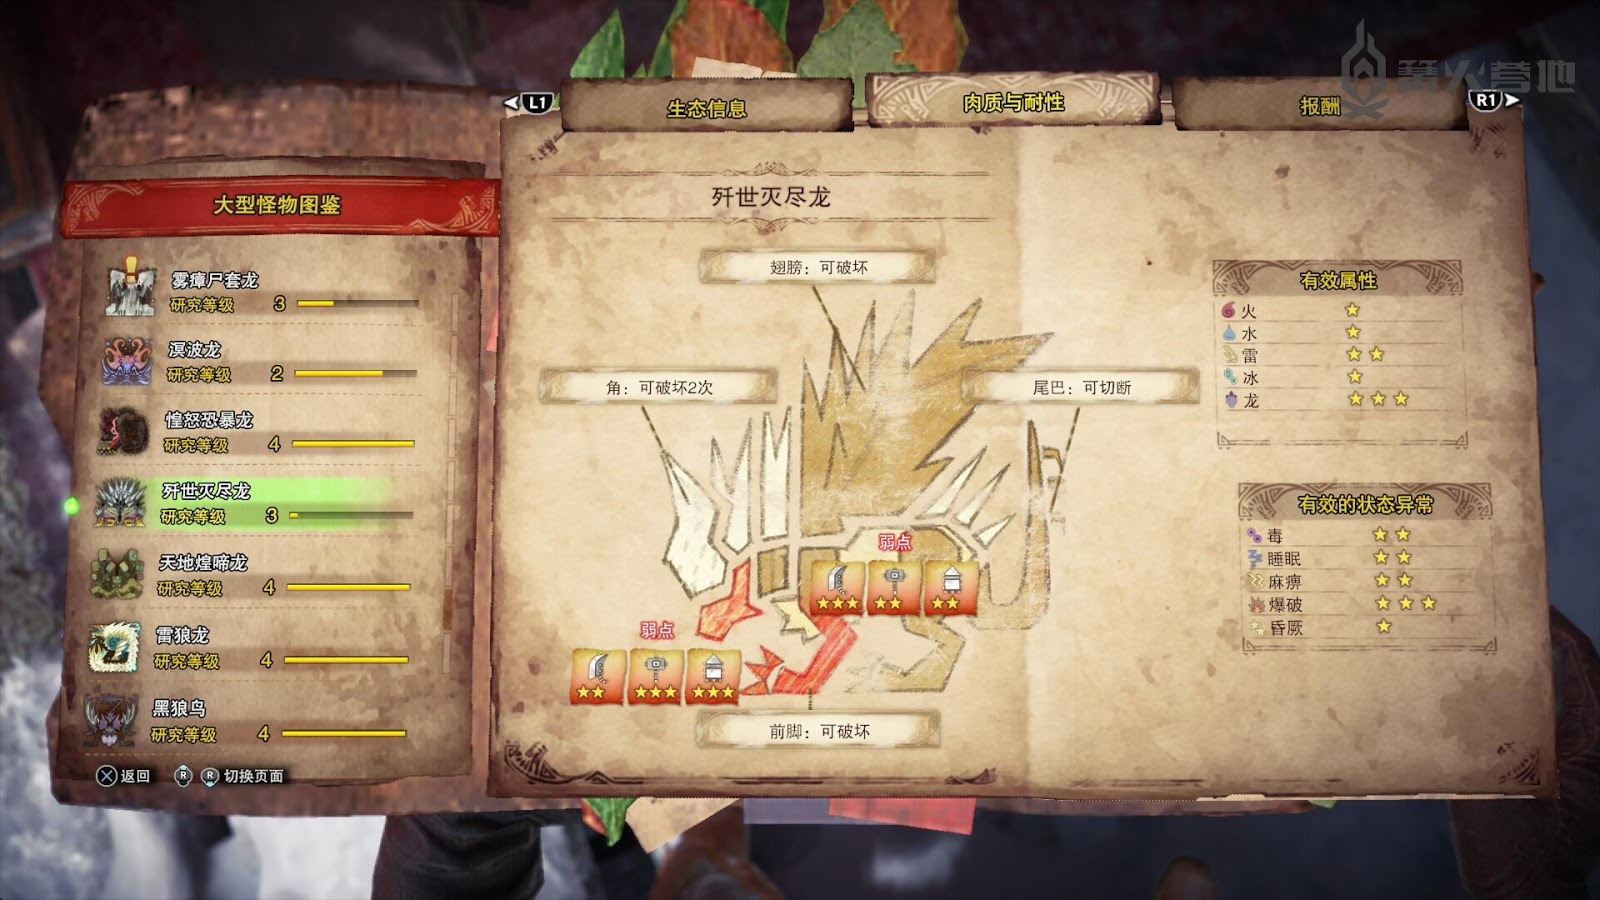 mhw Iceborne 殲世滅盡龍屬性弱點攻略 - 魔物獵人 世界 Monster Hunter World 遊戲世界